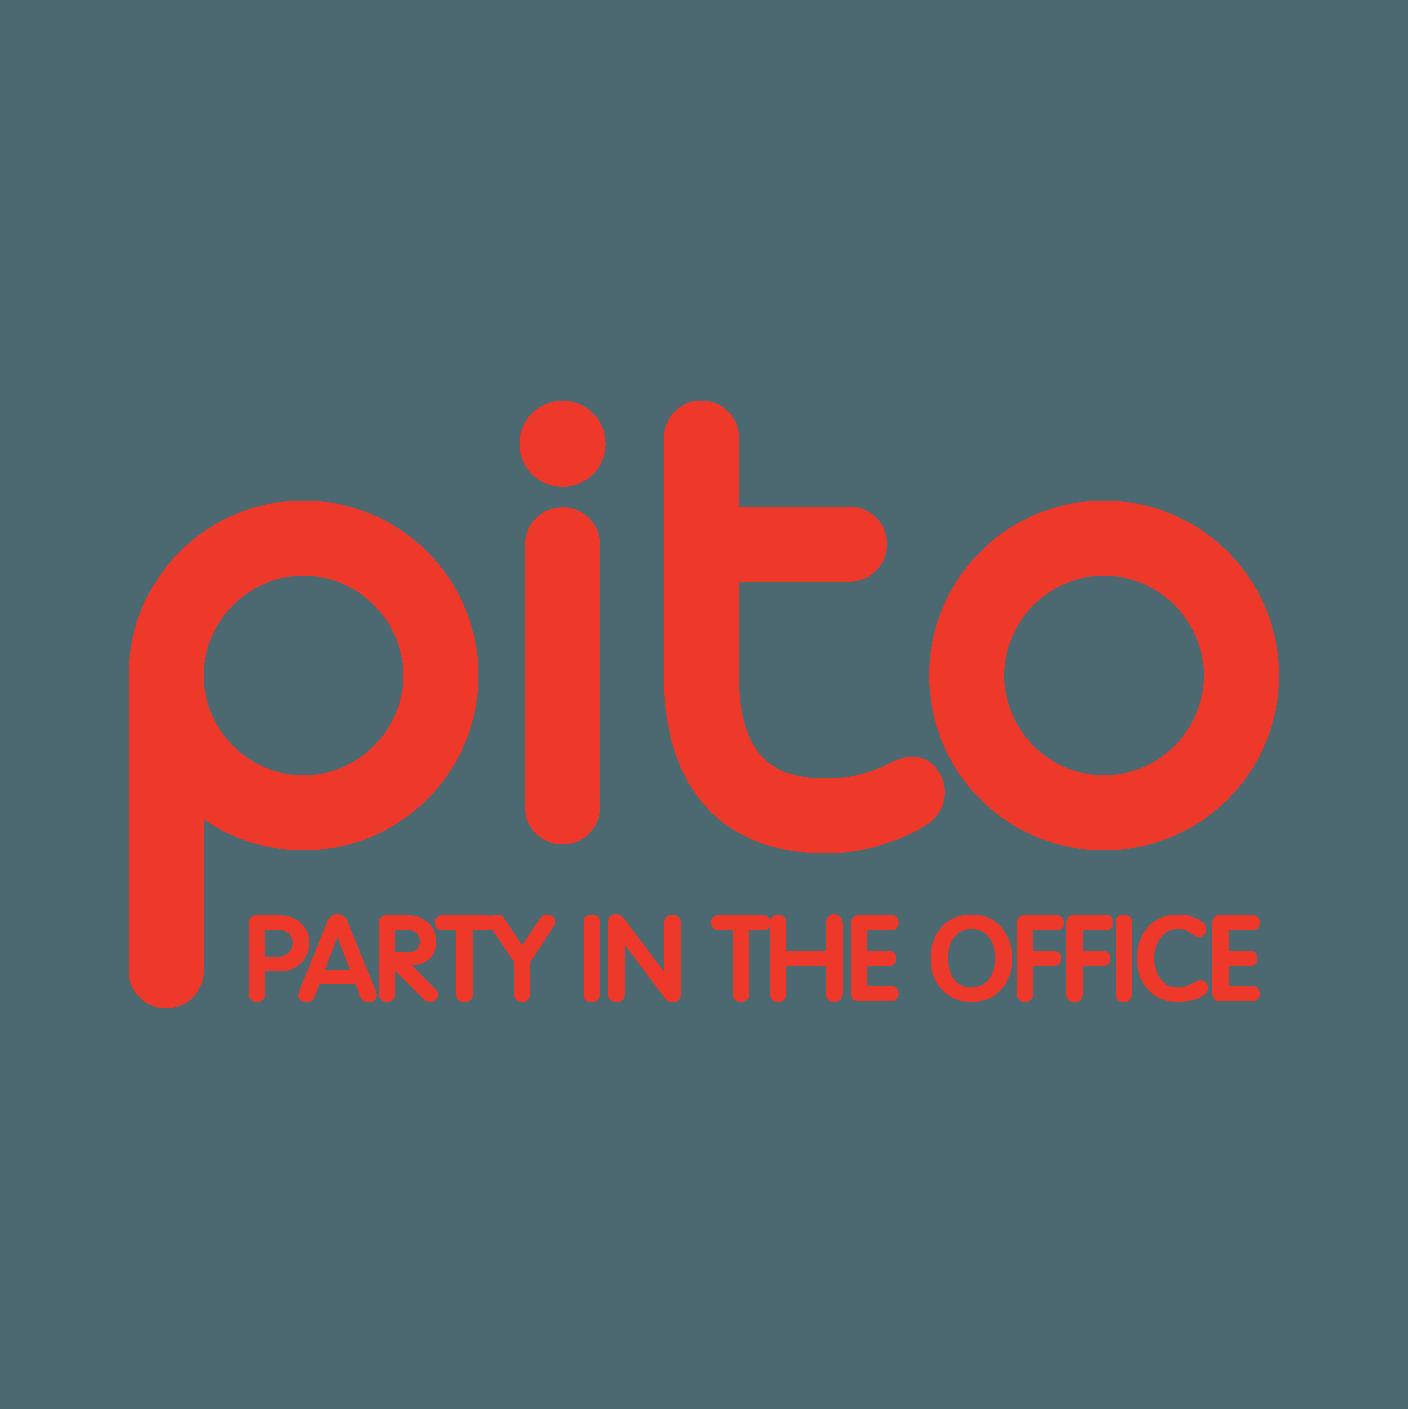 PITO Club